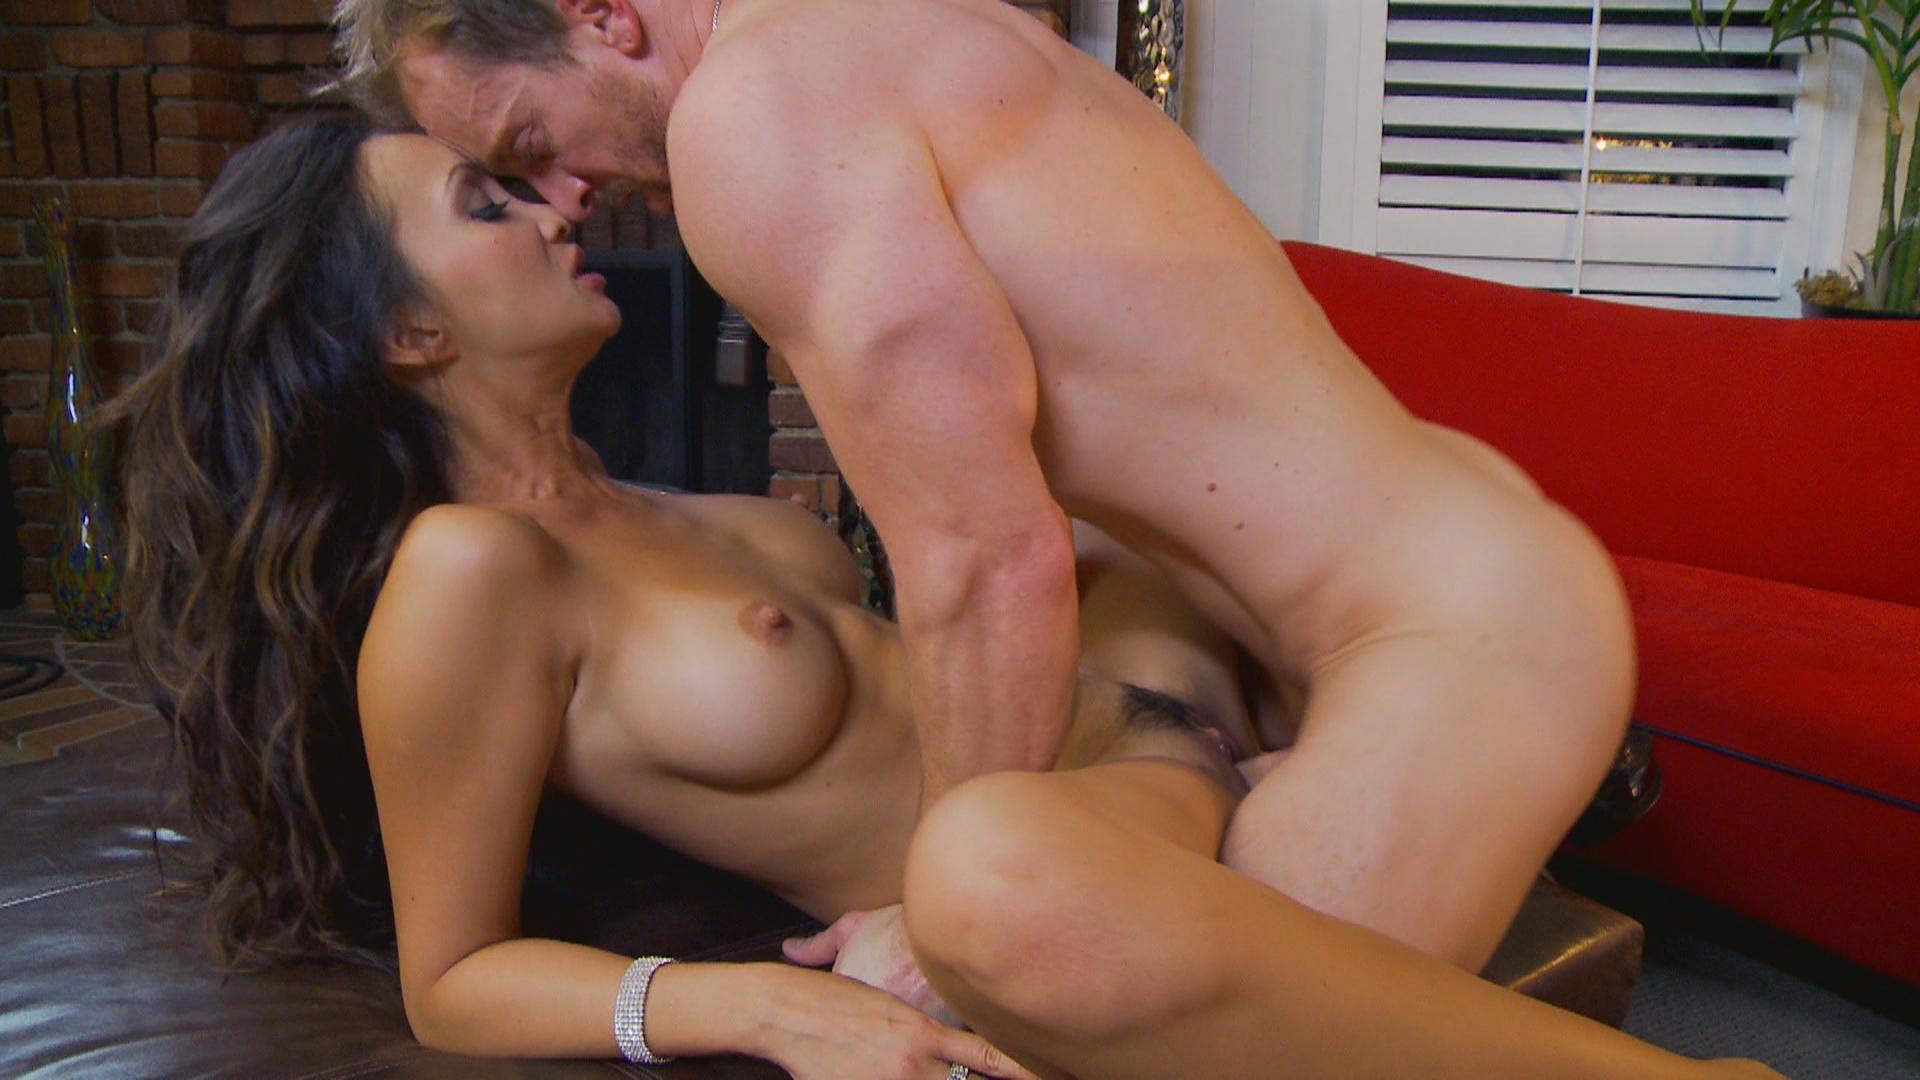 Kiss 2 xvideos182855